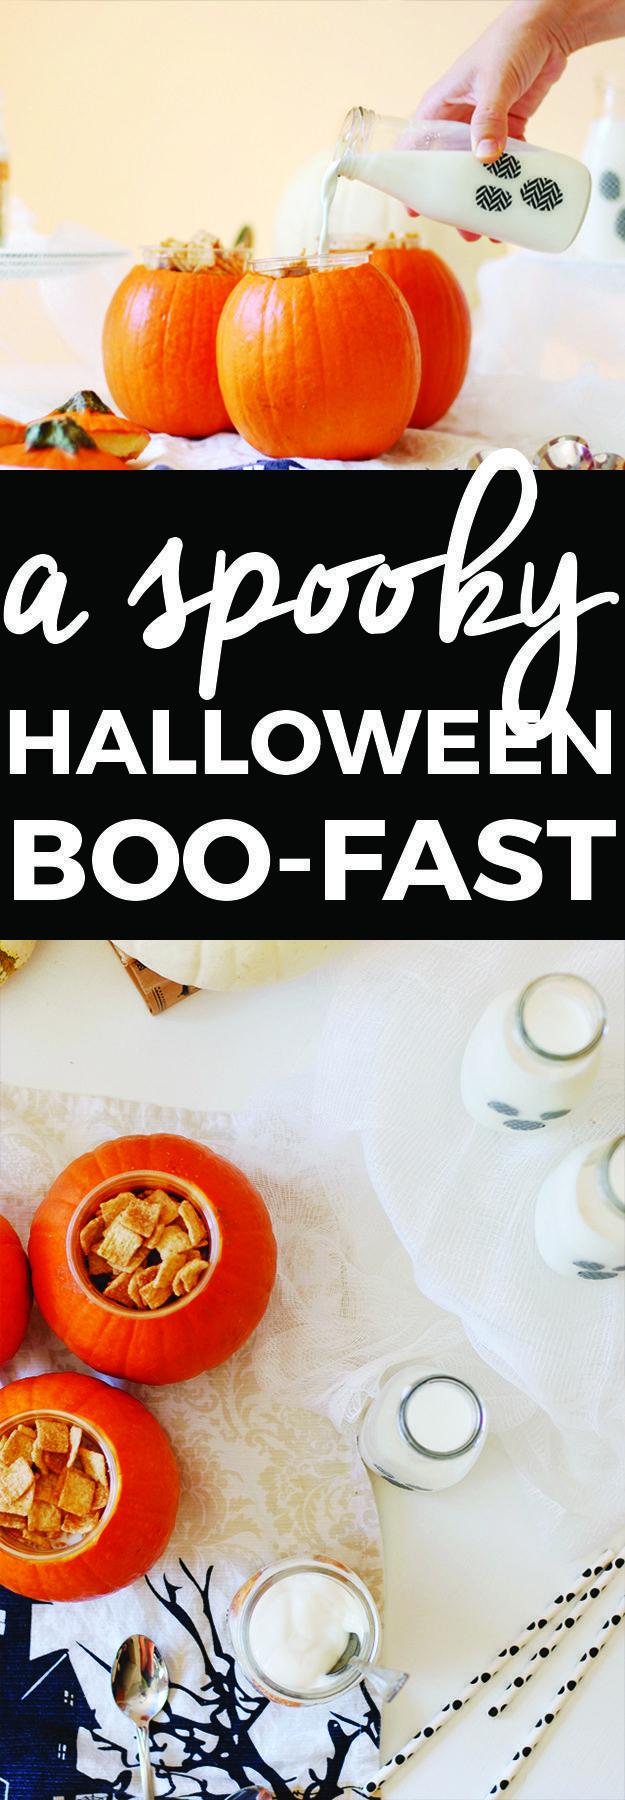 Make A Spooky Halloween Boo-fast #halloweenbreakfastforkids